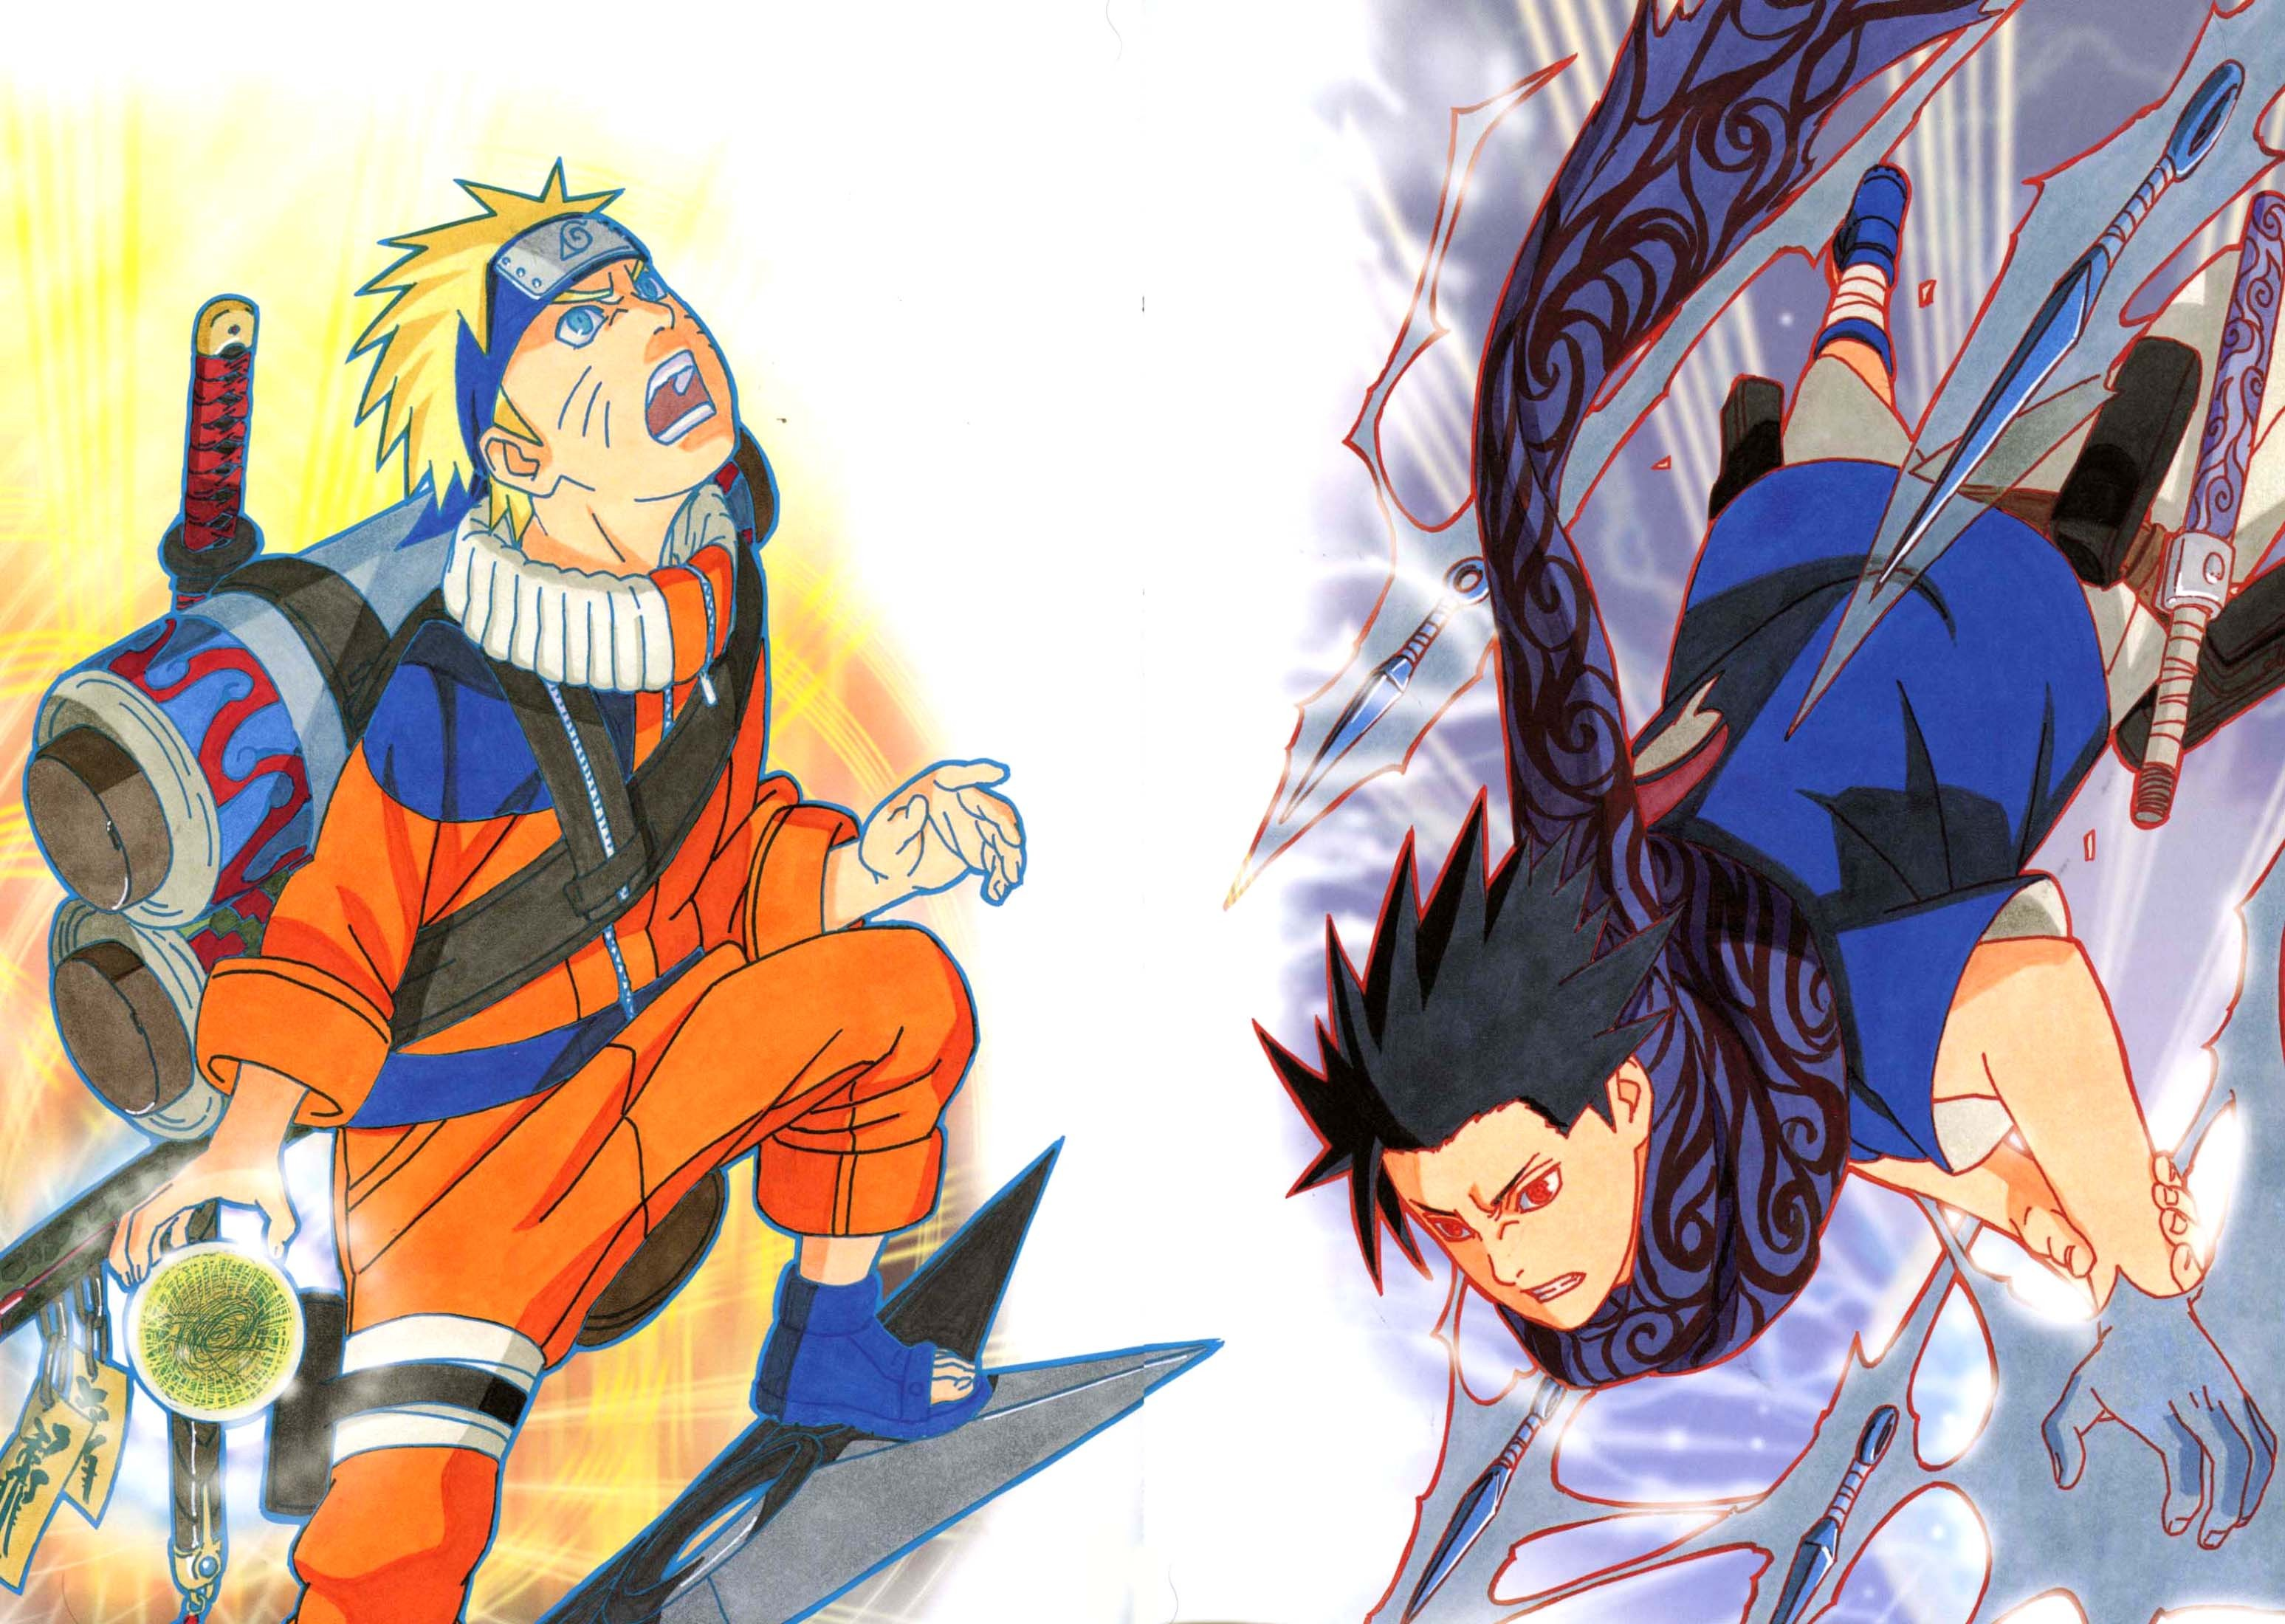 Naruto vs Sasuke Full HD Fond d'écran and Arrière-Plan   3095x2200   ID:486960